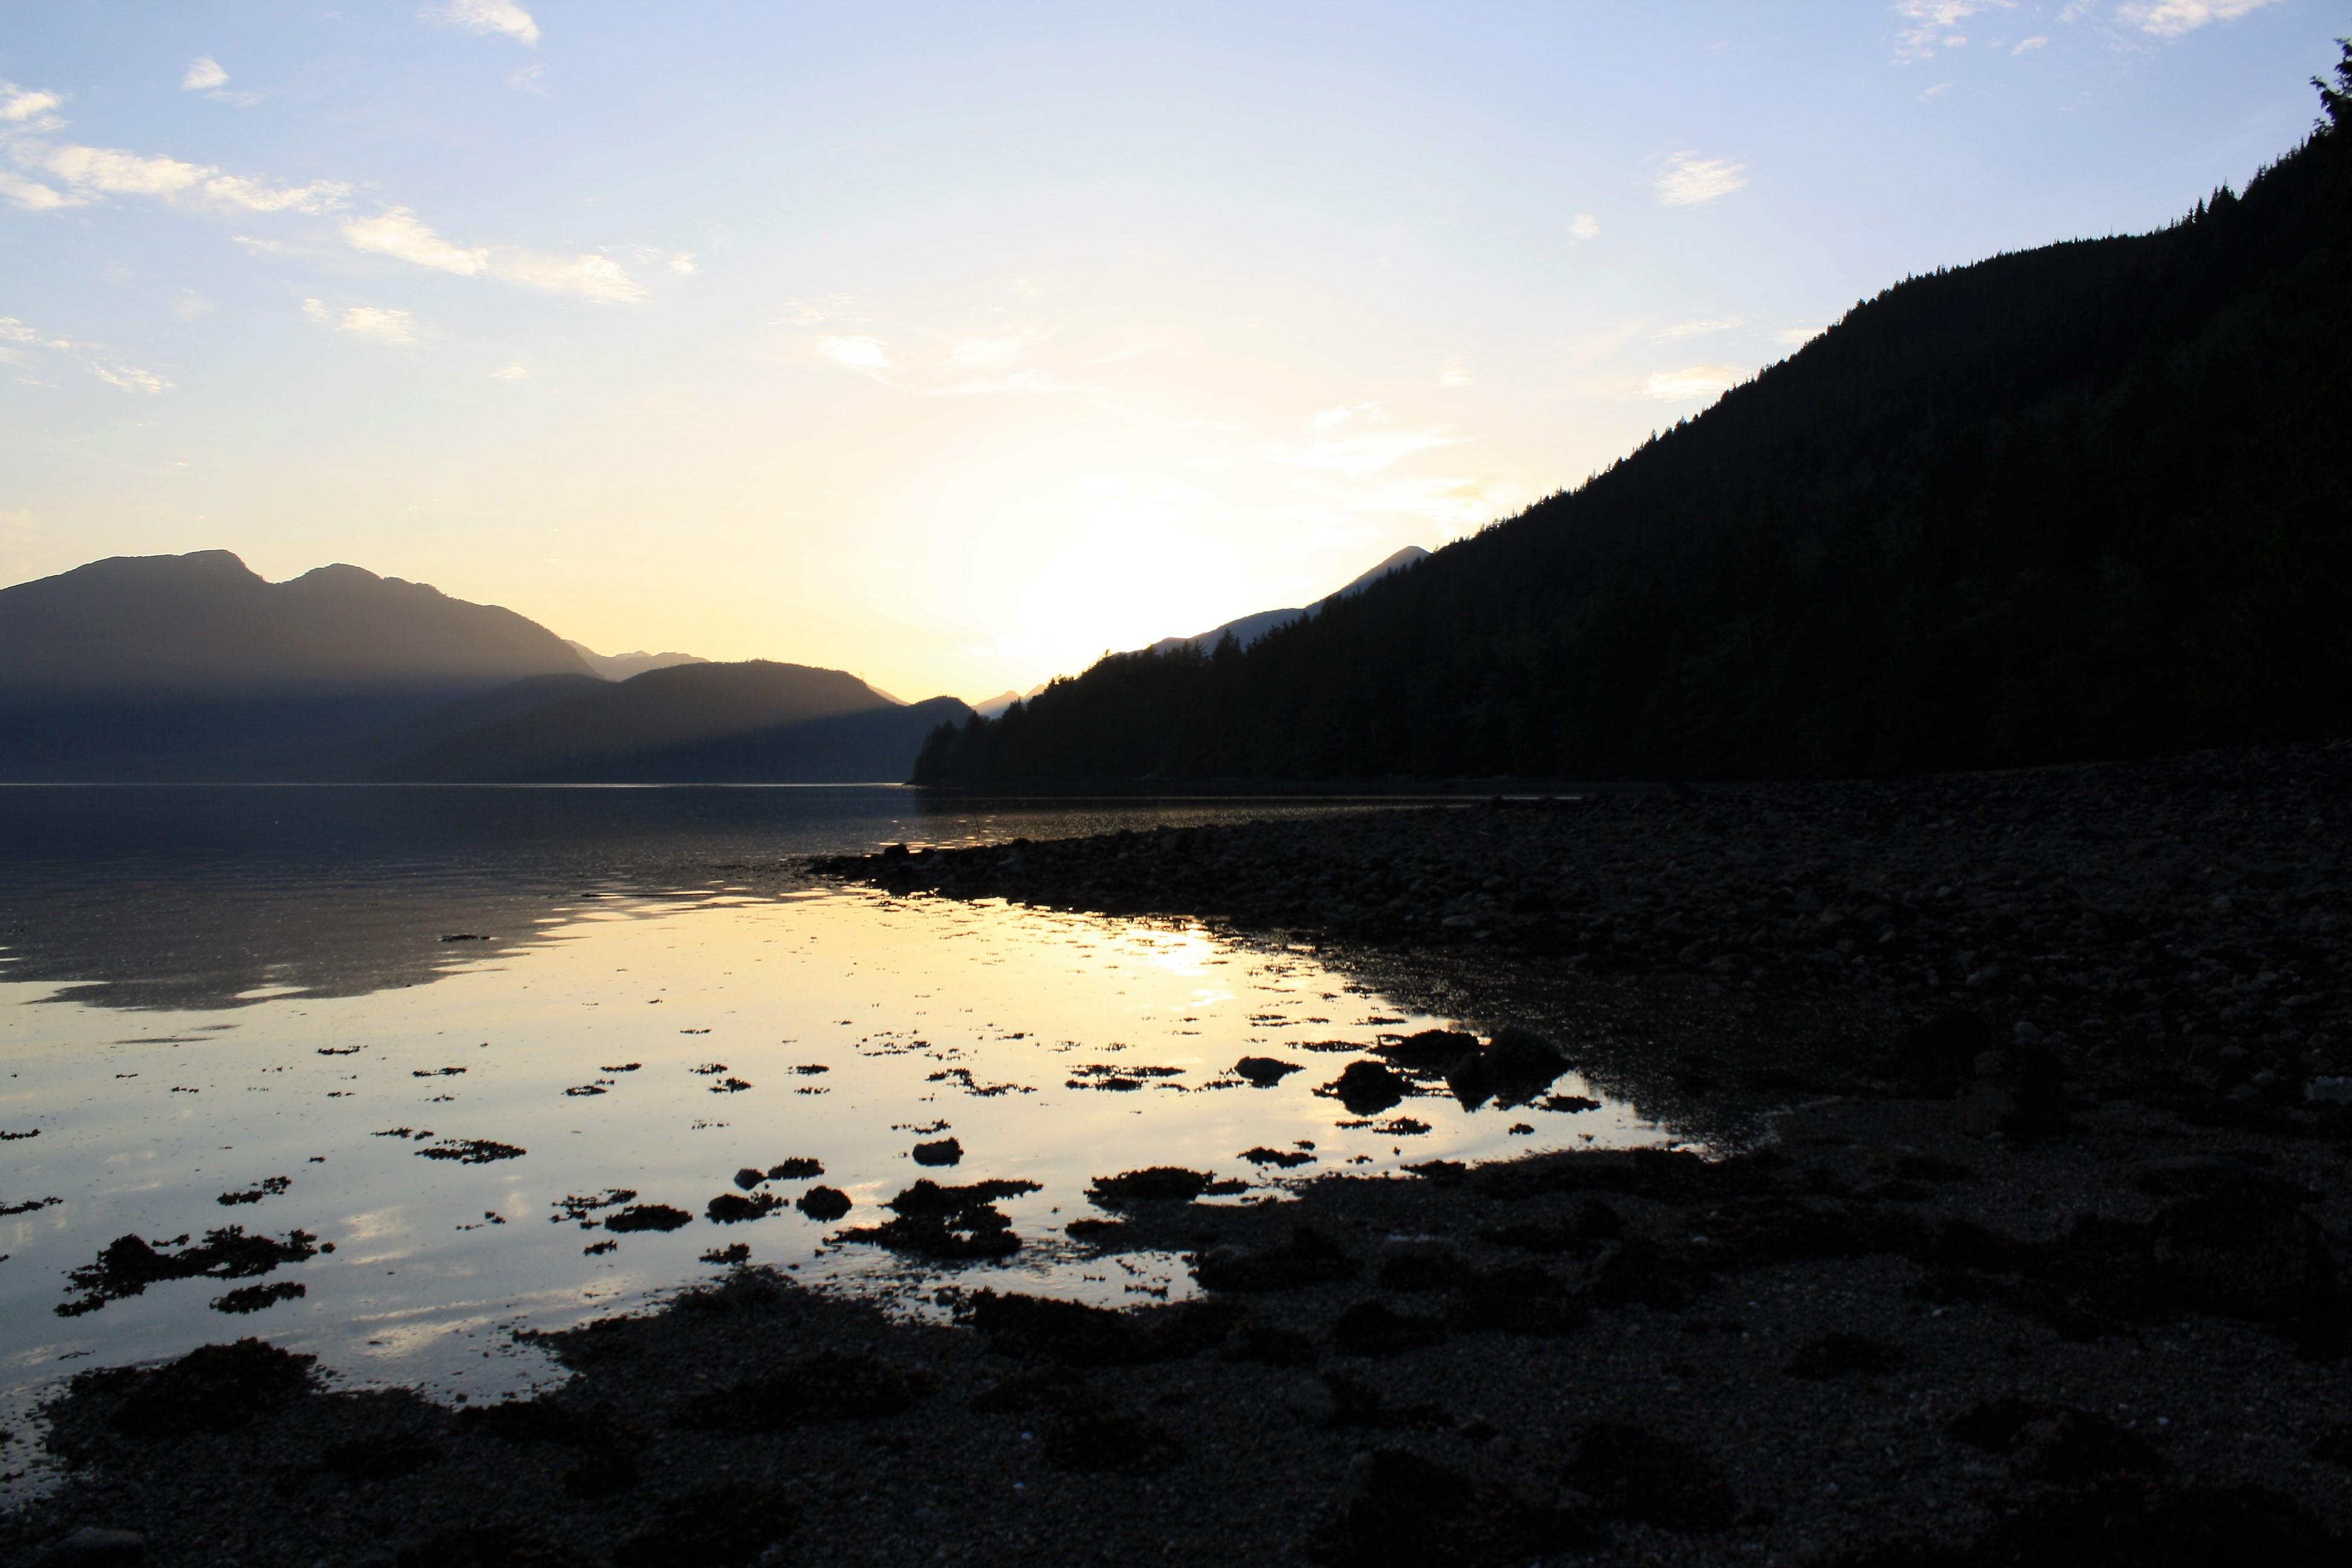 DM_nature_landscape_oceanwater_haidagwai